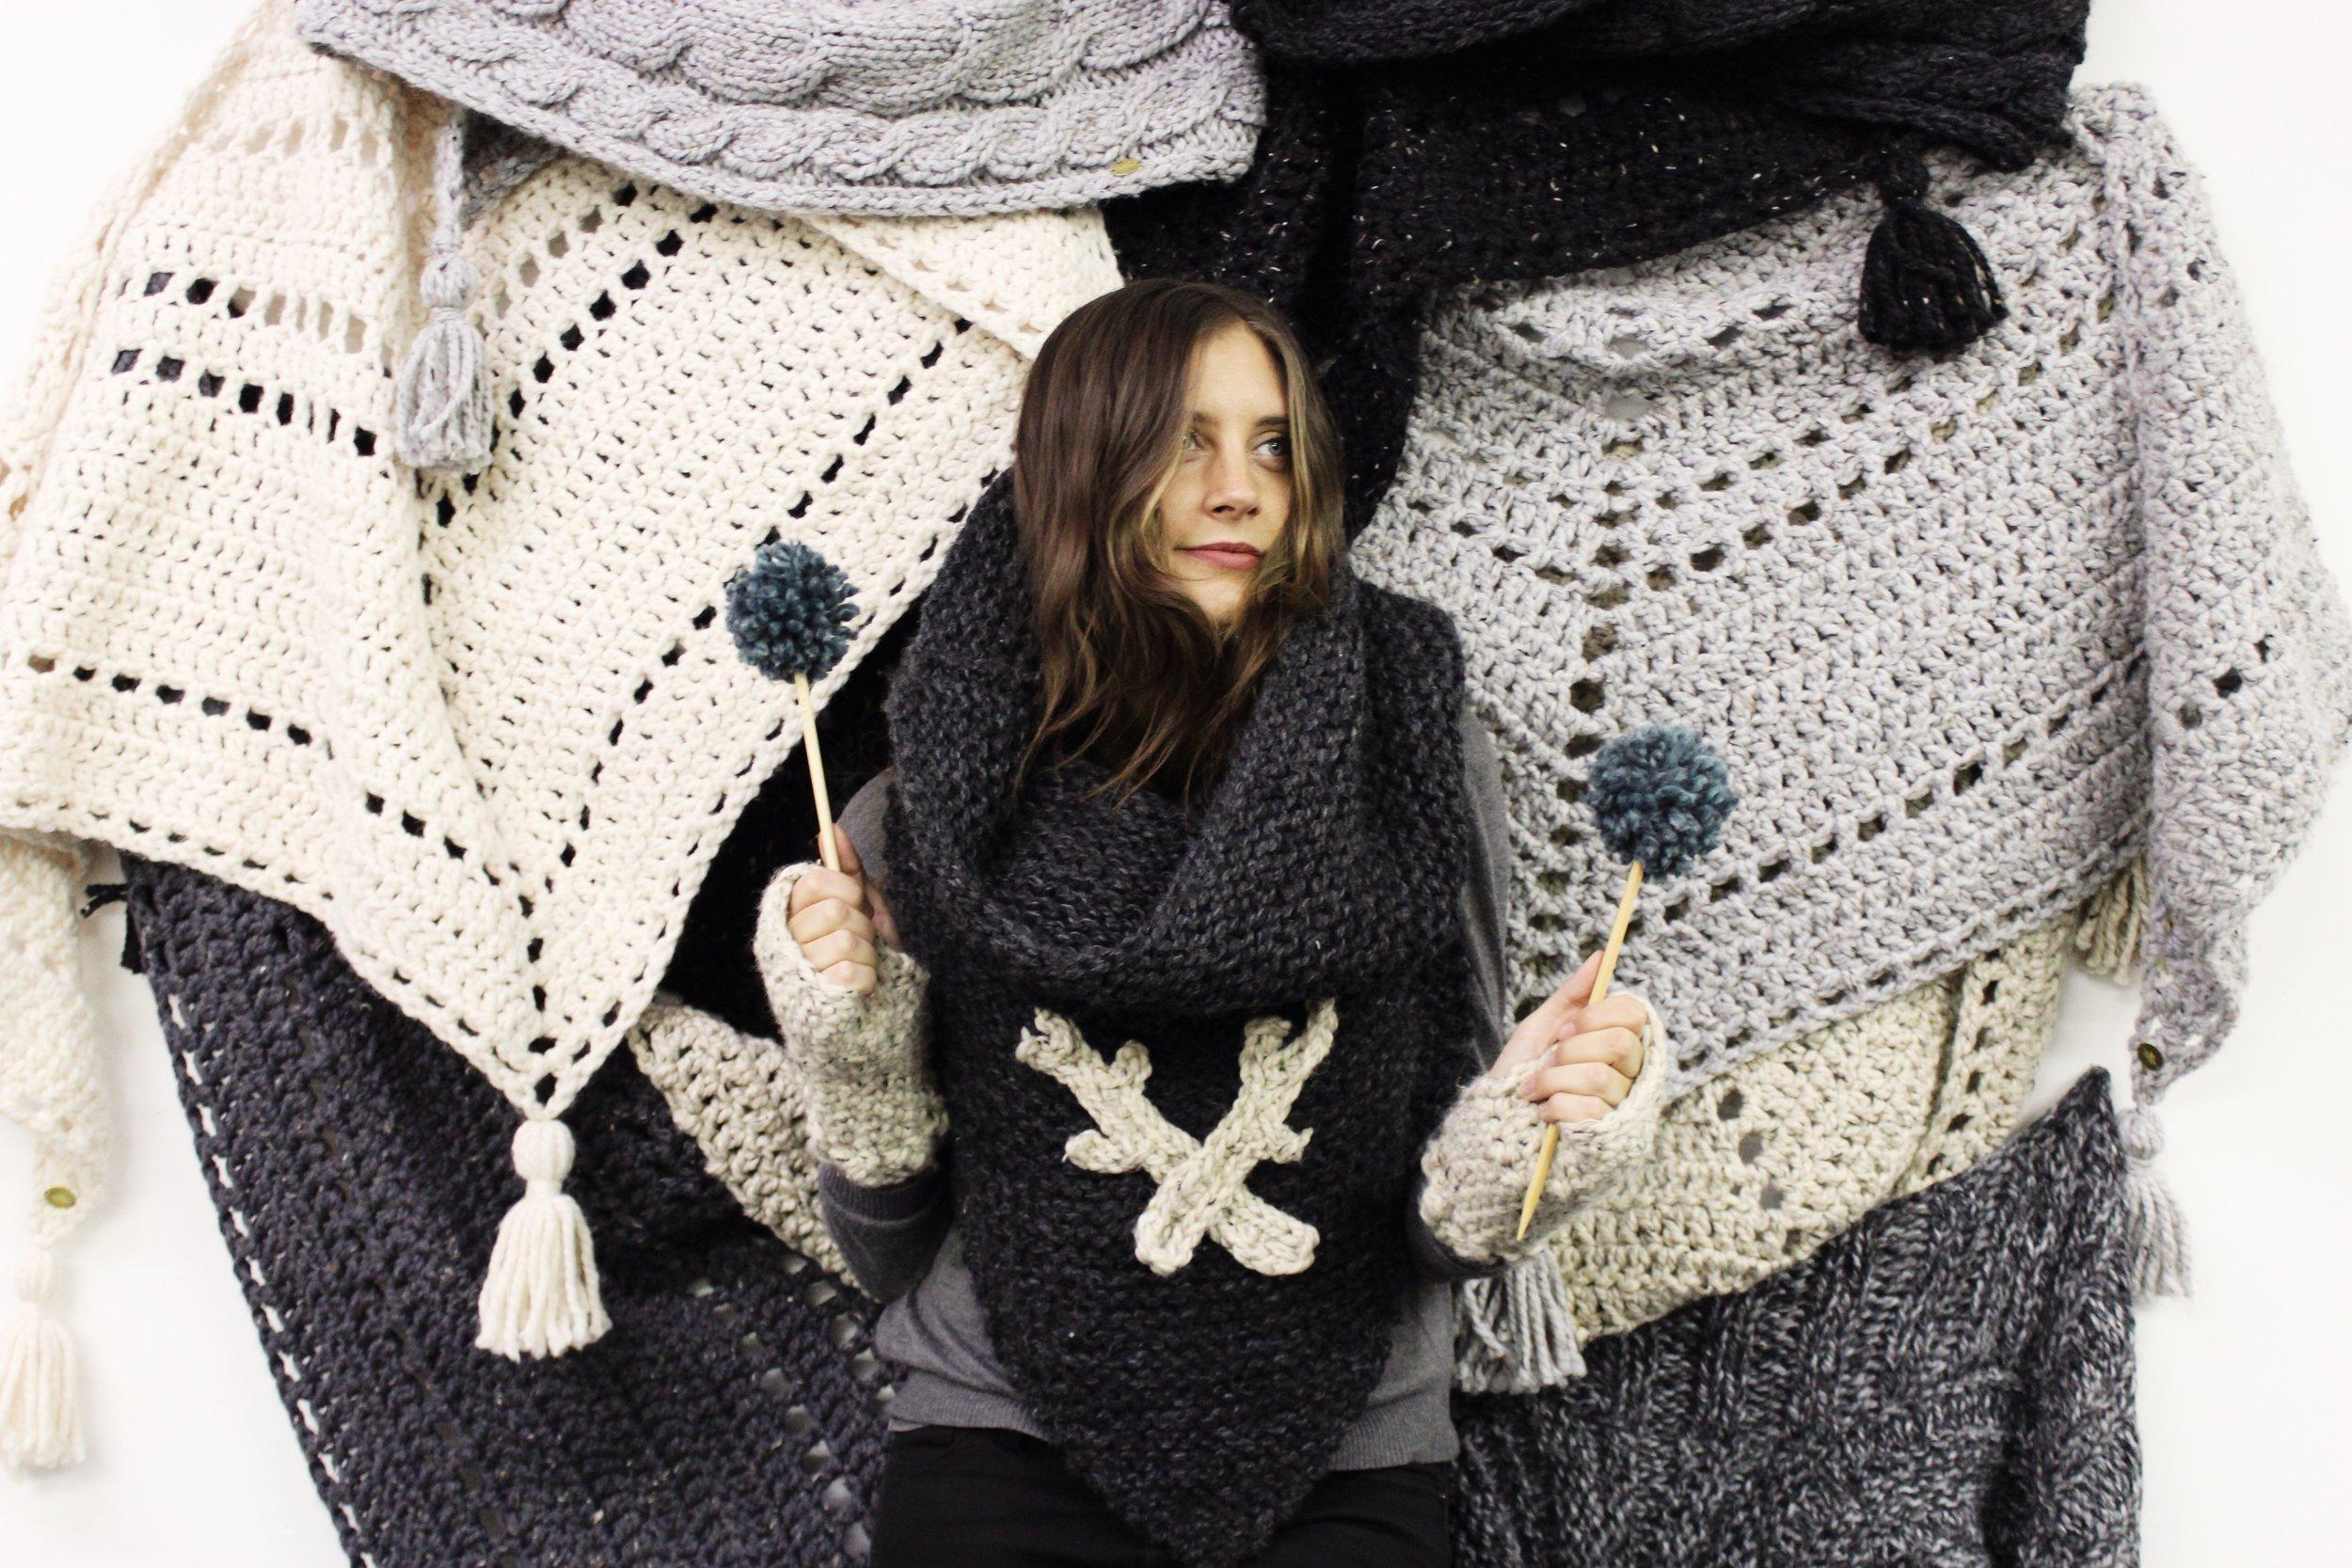 Yarn Hero Alexandra Tavel of Two of Wands